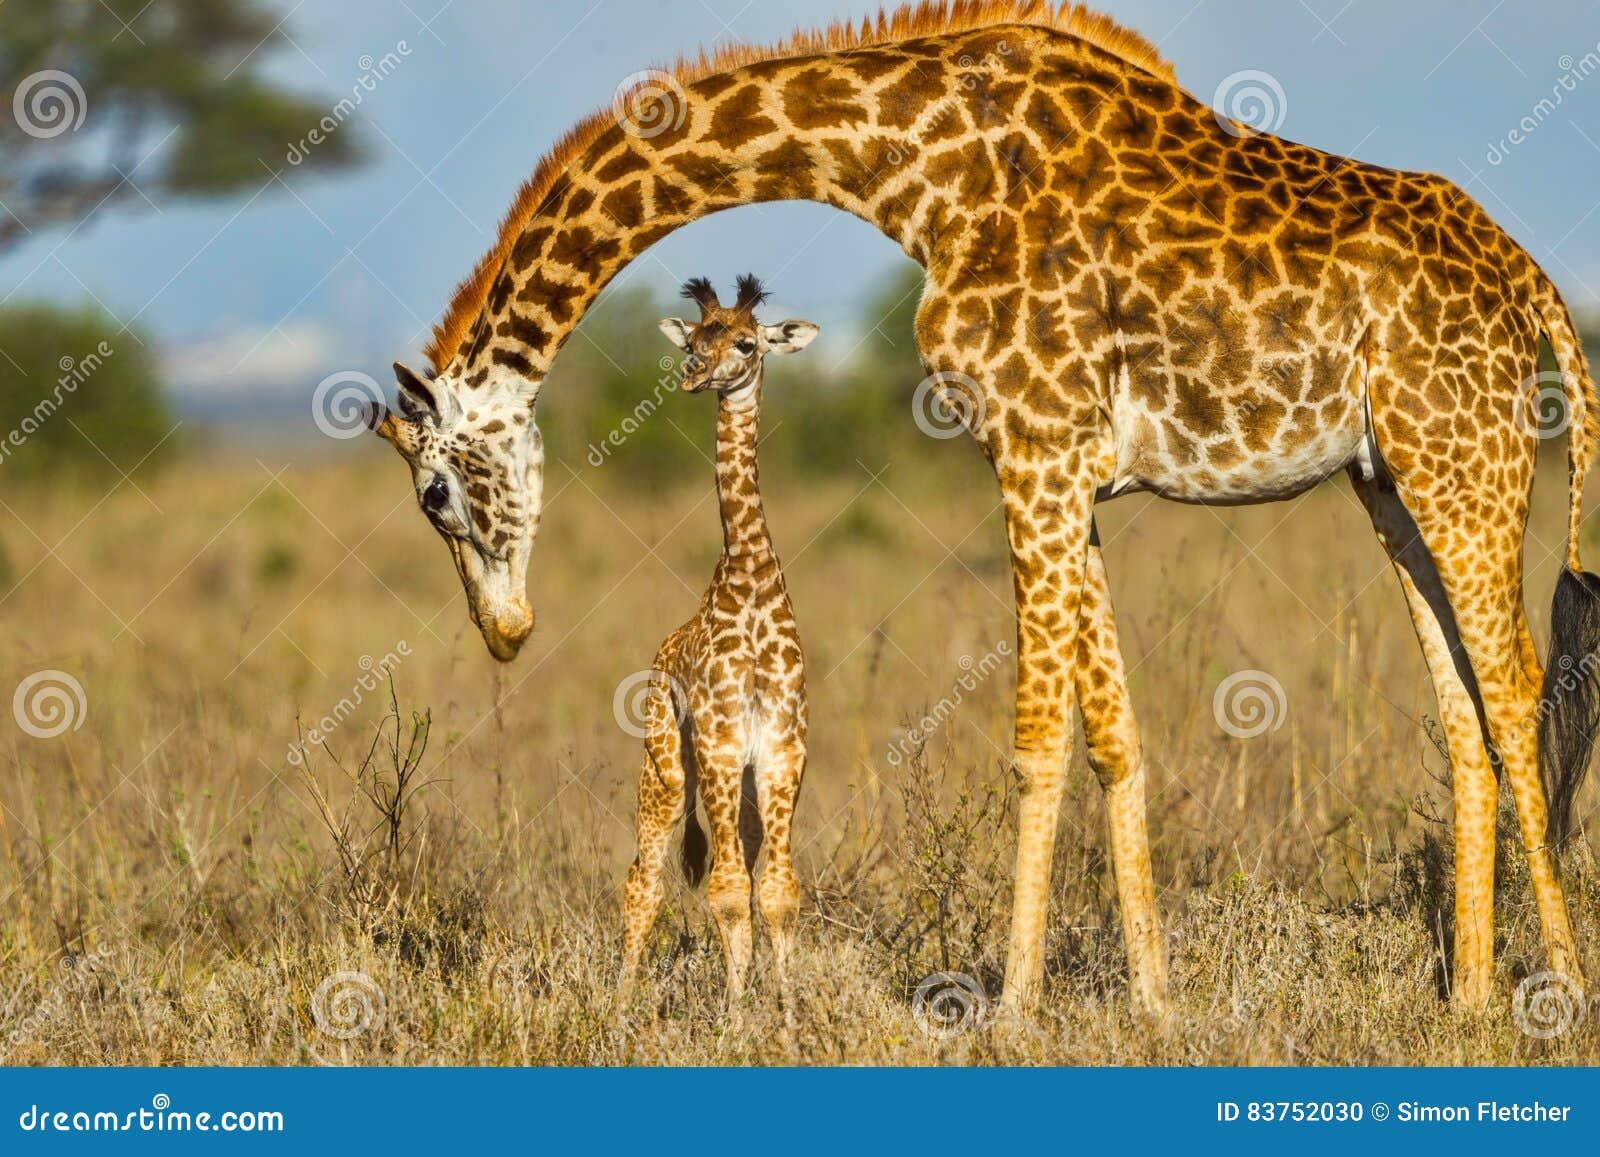 Download Mother Masai Giraffe Protecting Baby Stock Photo - Image of creature, calf: 83752030